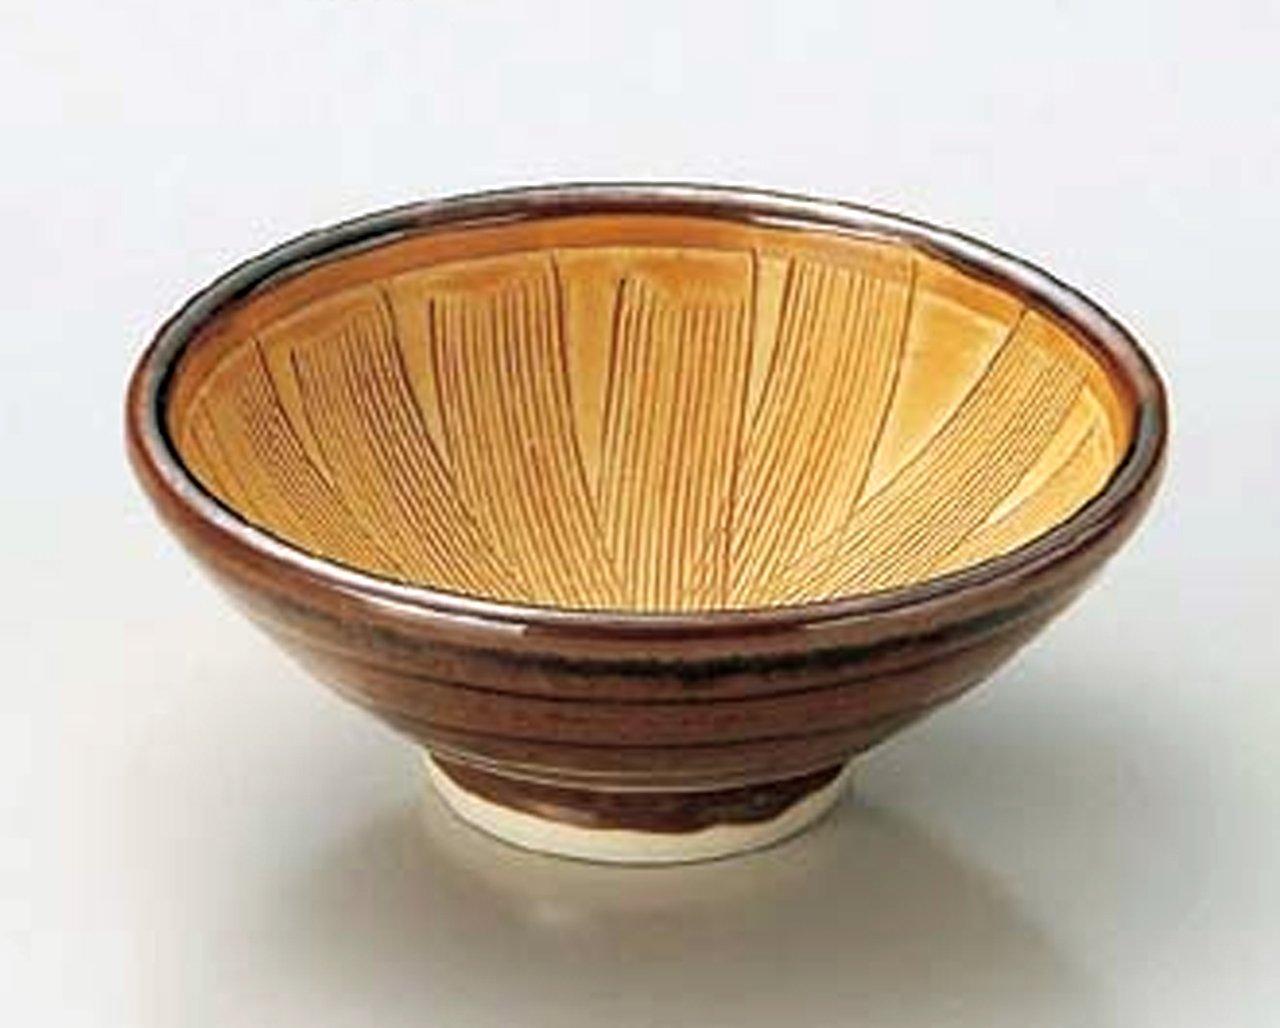 SOTOSABI-SURIBACHI 3.3inches Small Bowl Japanese original Porcelain watou.asia